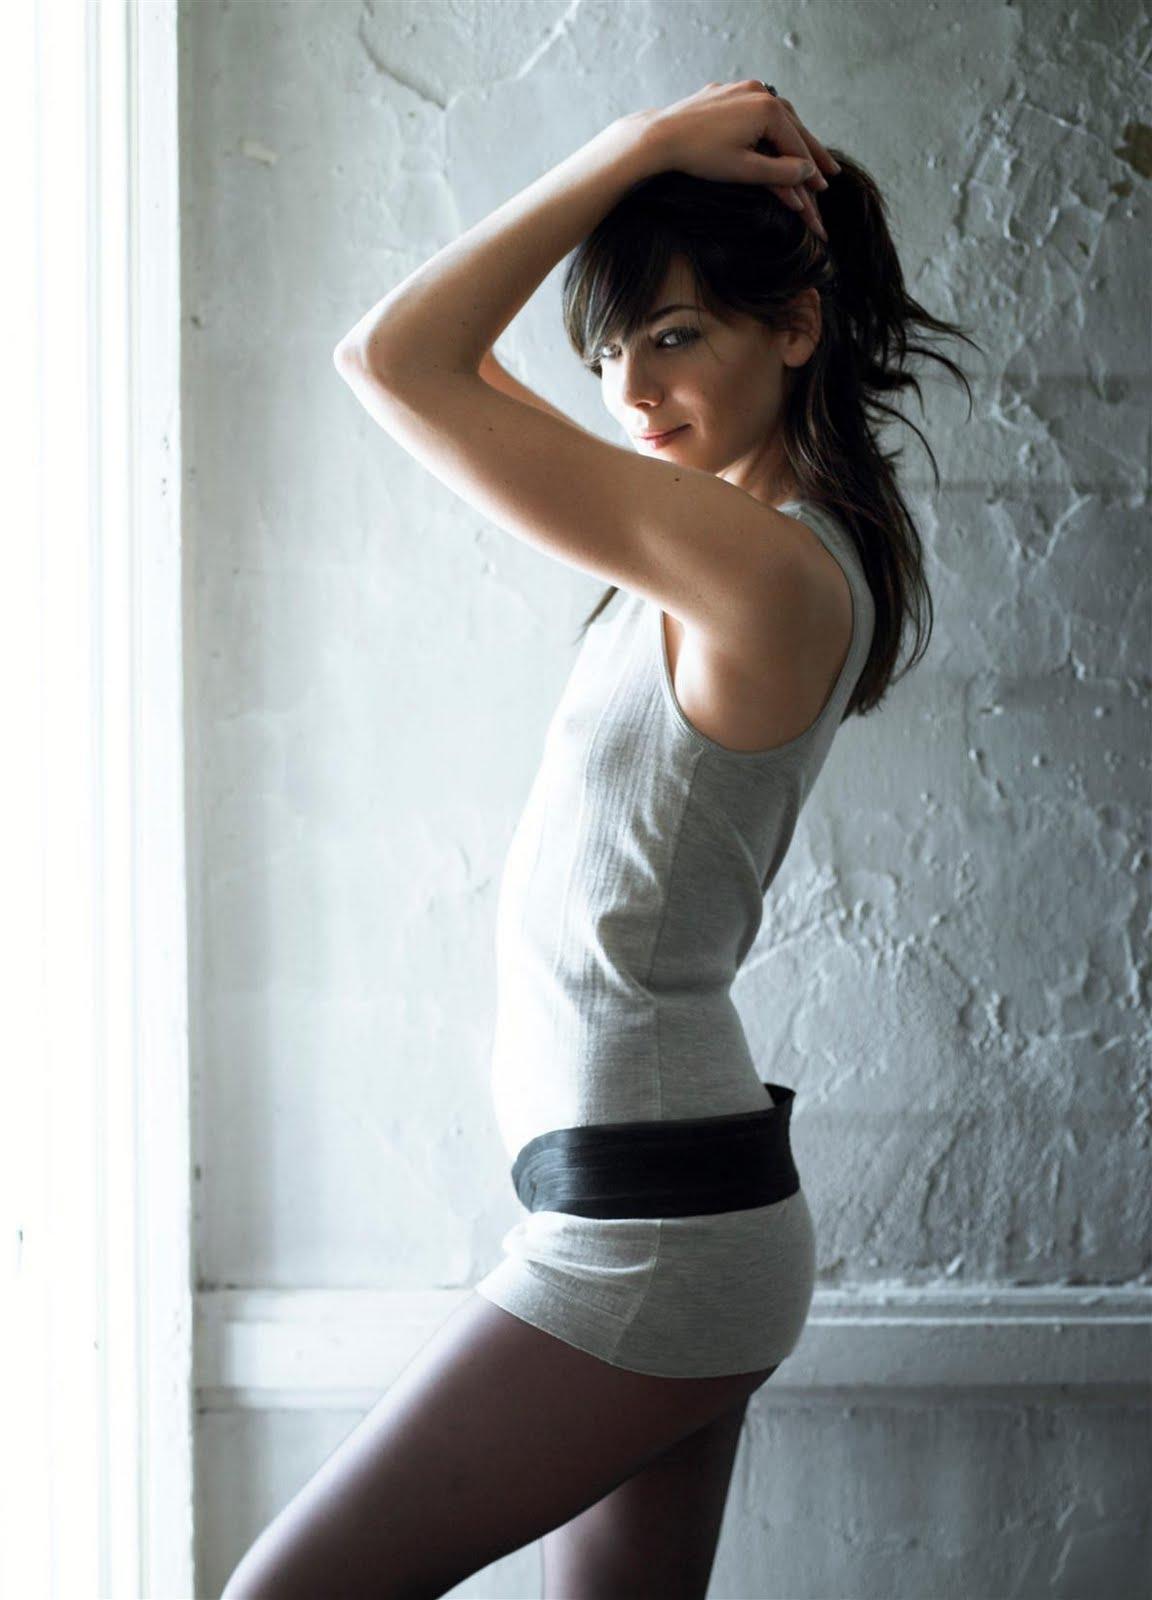 http://3.bp.blogspot.com/_vvMUg8mhXp4/Sw5cMy7jWDI/AAAAAAAACf8/m_gCqfMY0tc/s1600/MichelleMonaghan0+%2813%29.jpg